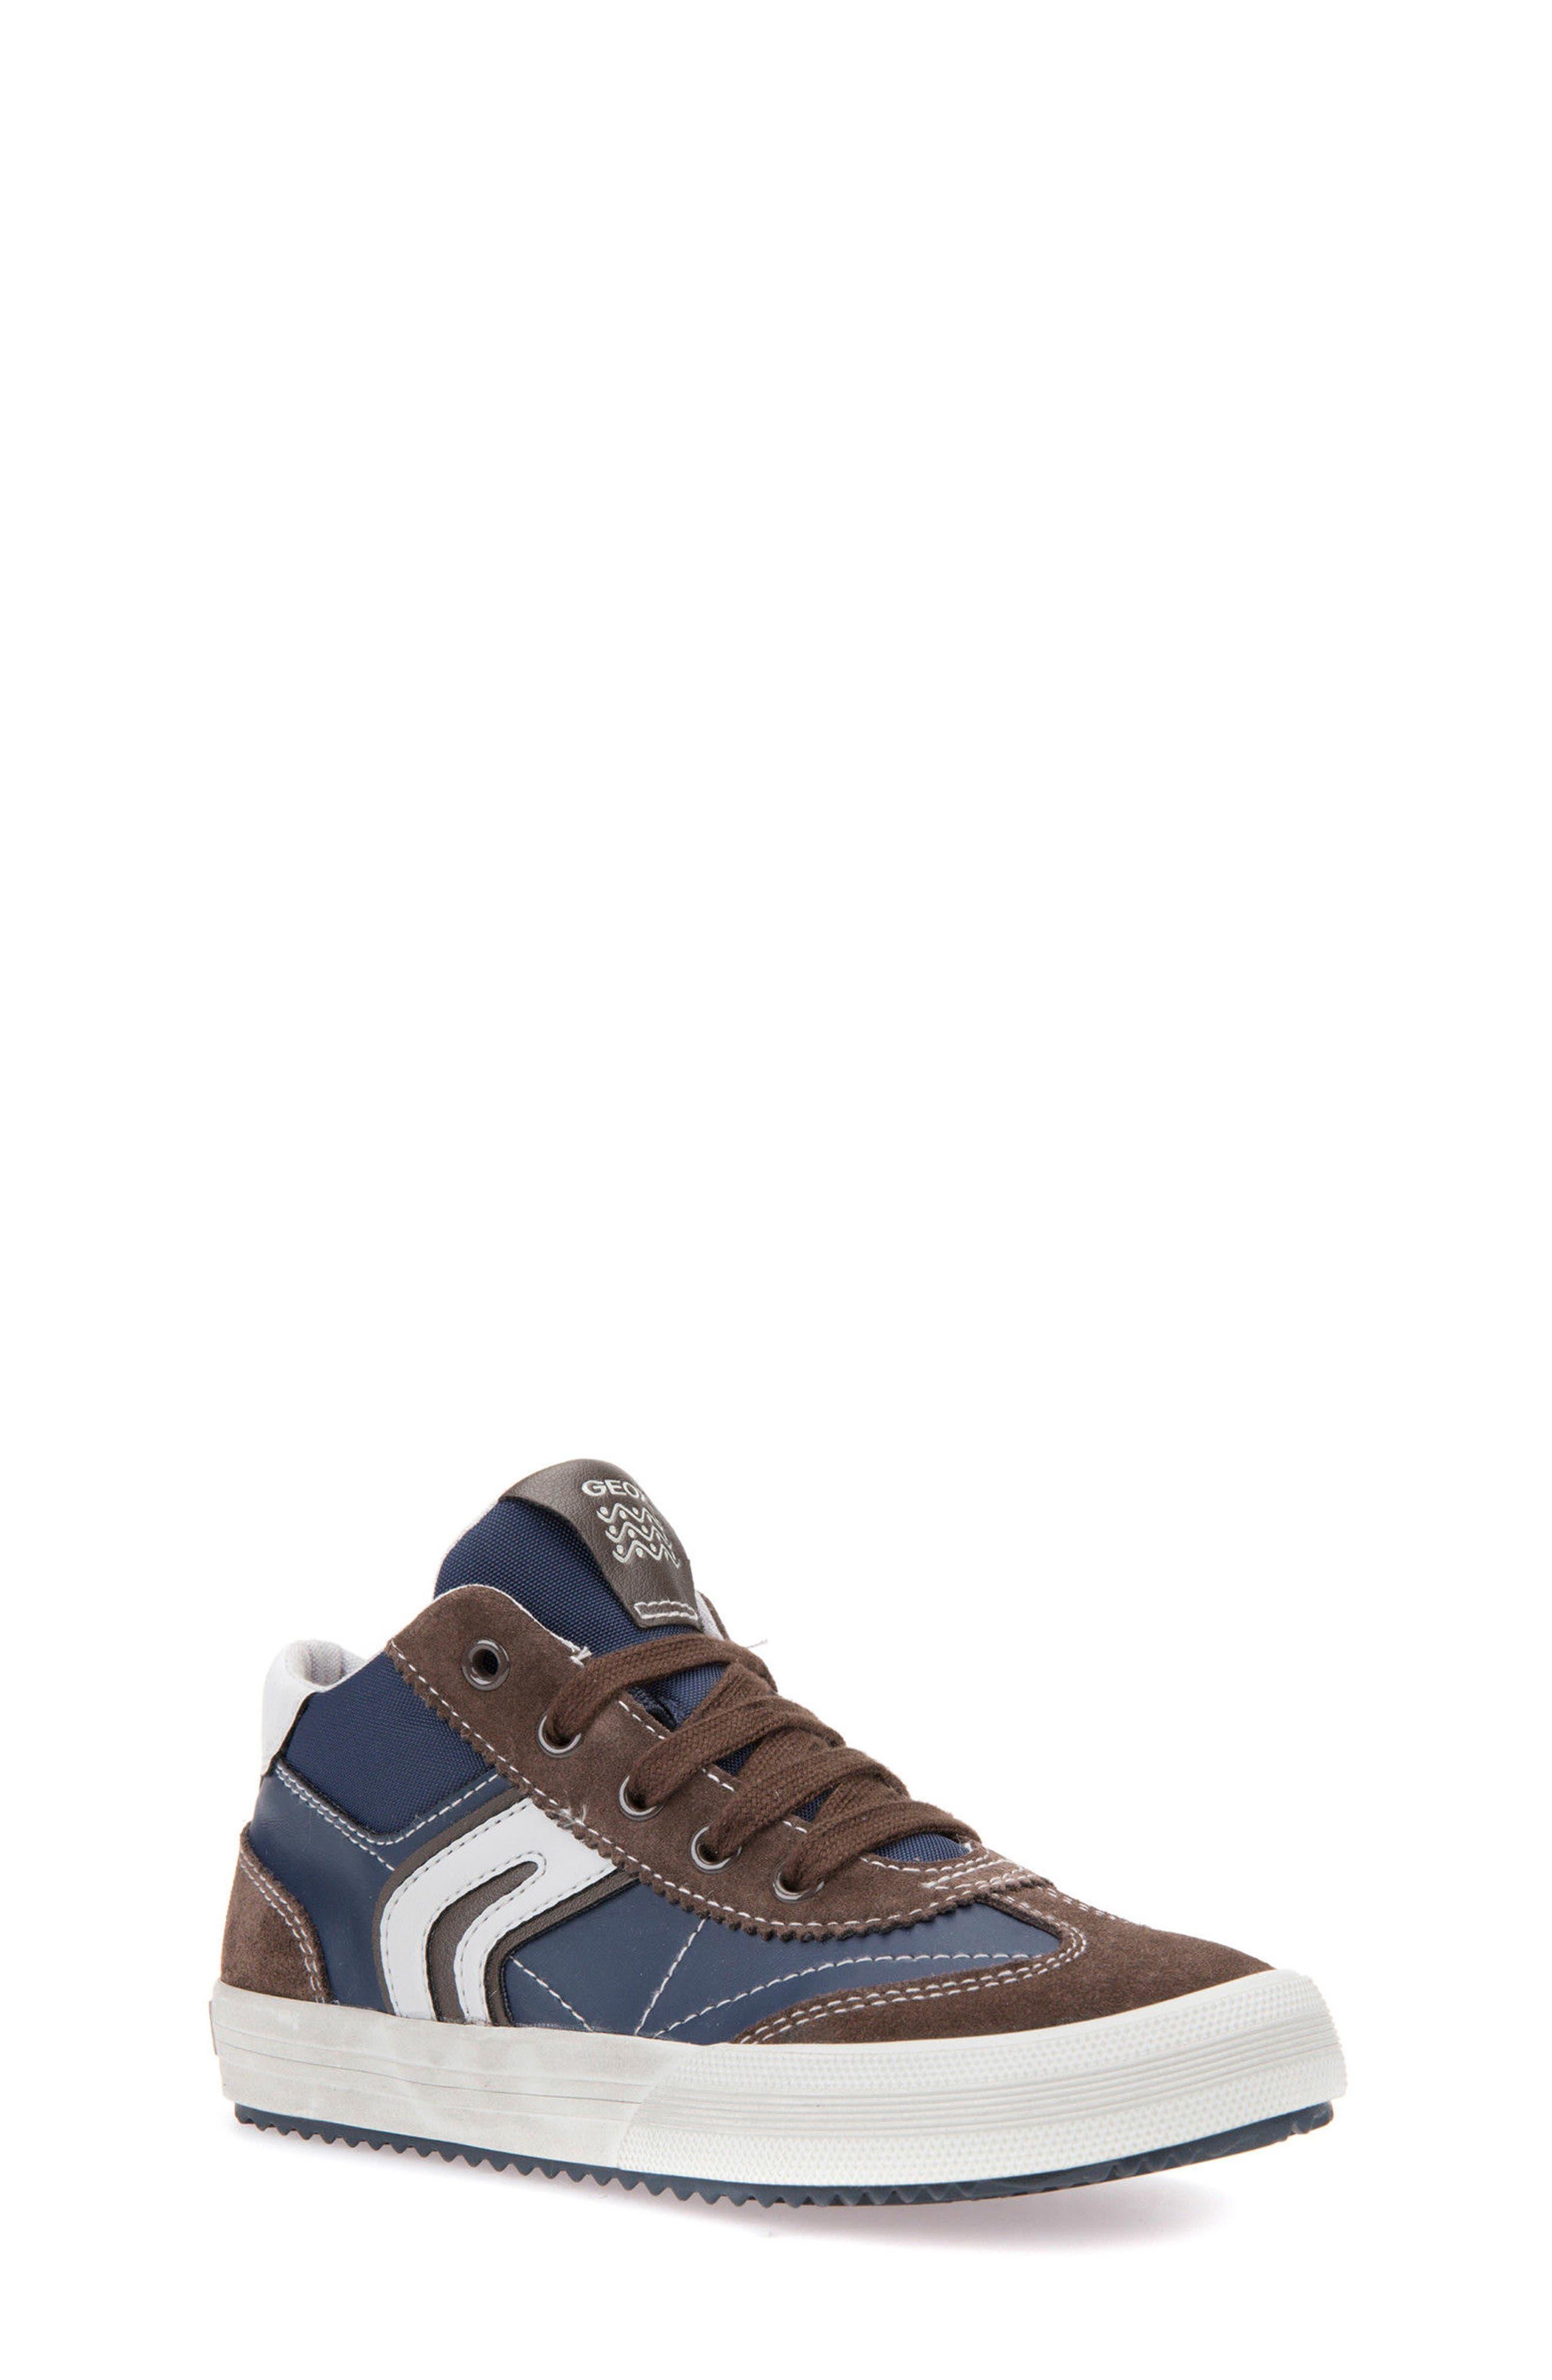 Alternate Image 1 Selected - Geox Alonisso Mid Top Sneaker (Toddler, Little Kid & Big Kid)